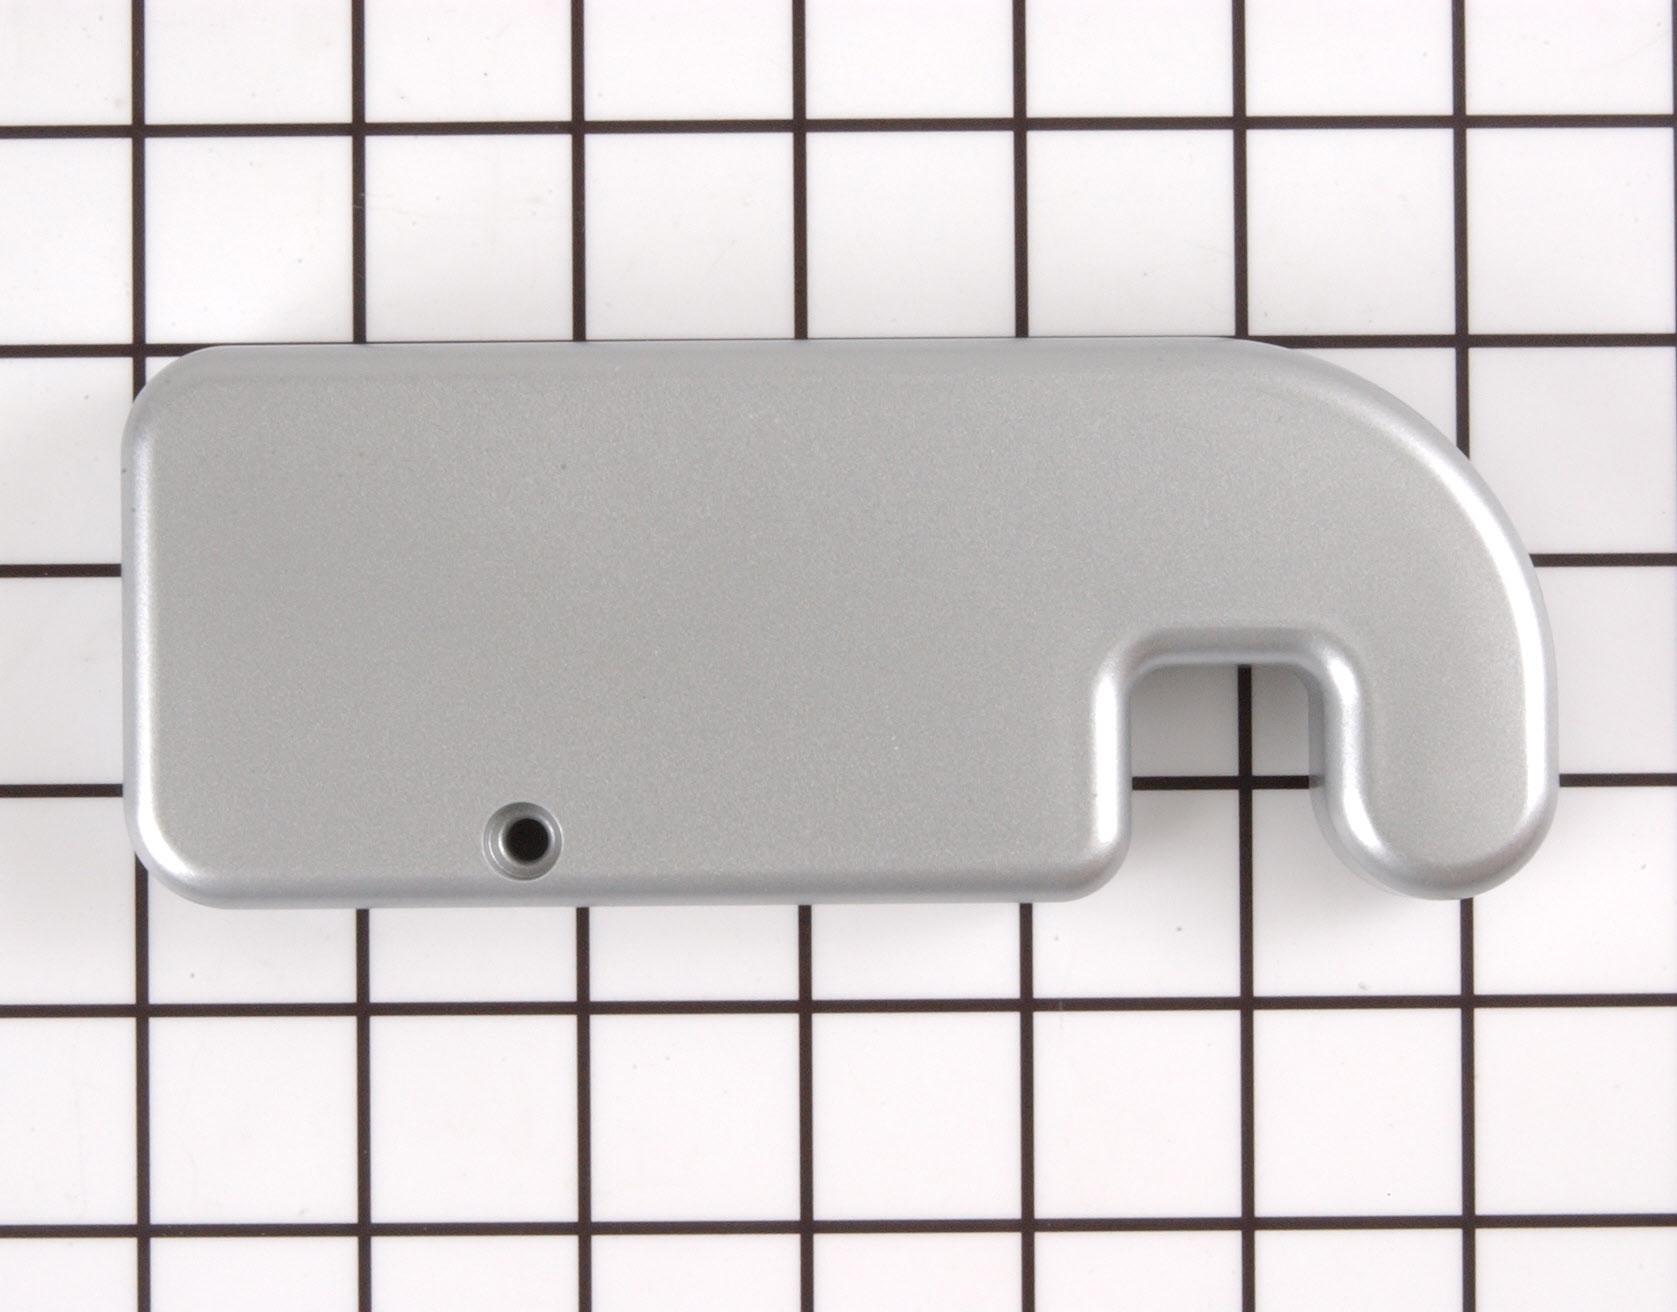 12001982 Bosch Refrigerator Part -Hinge Cover